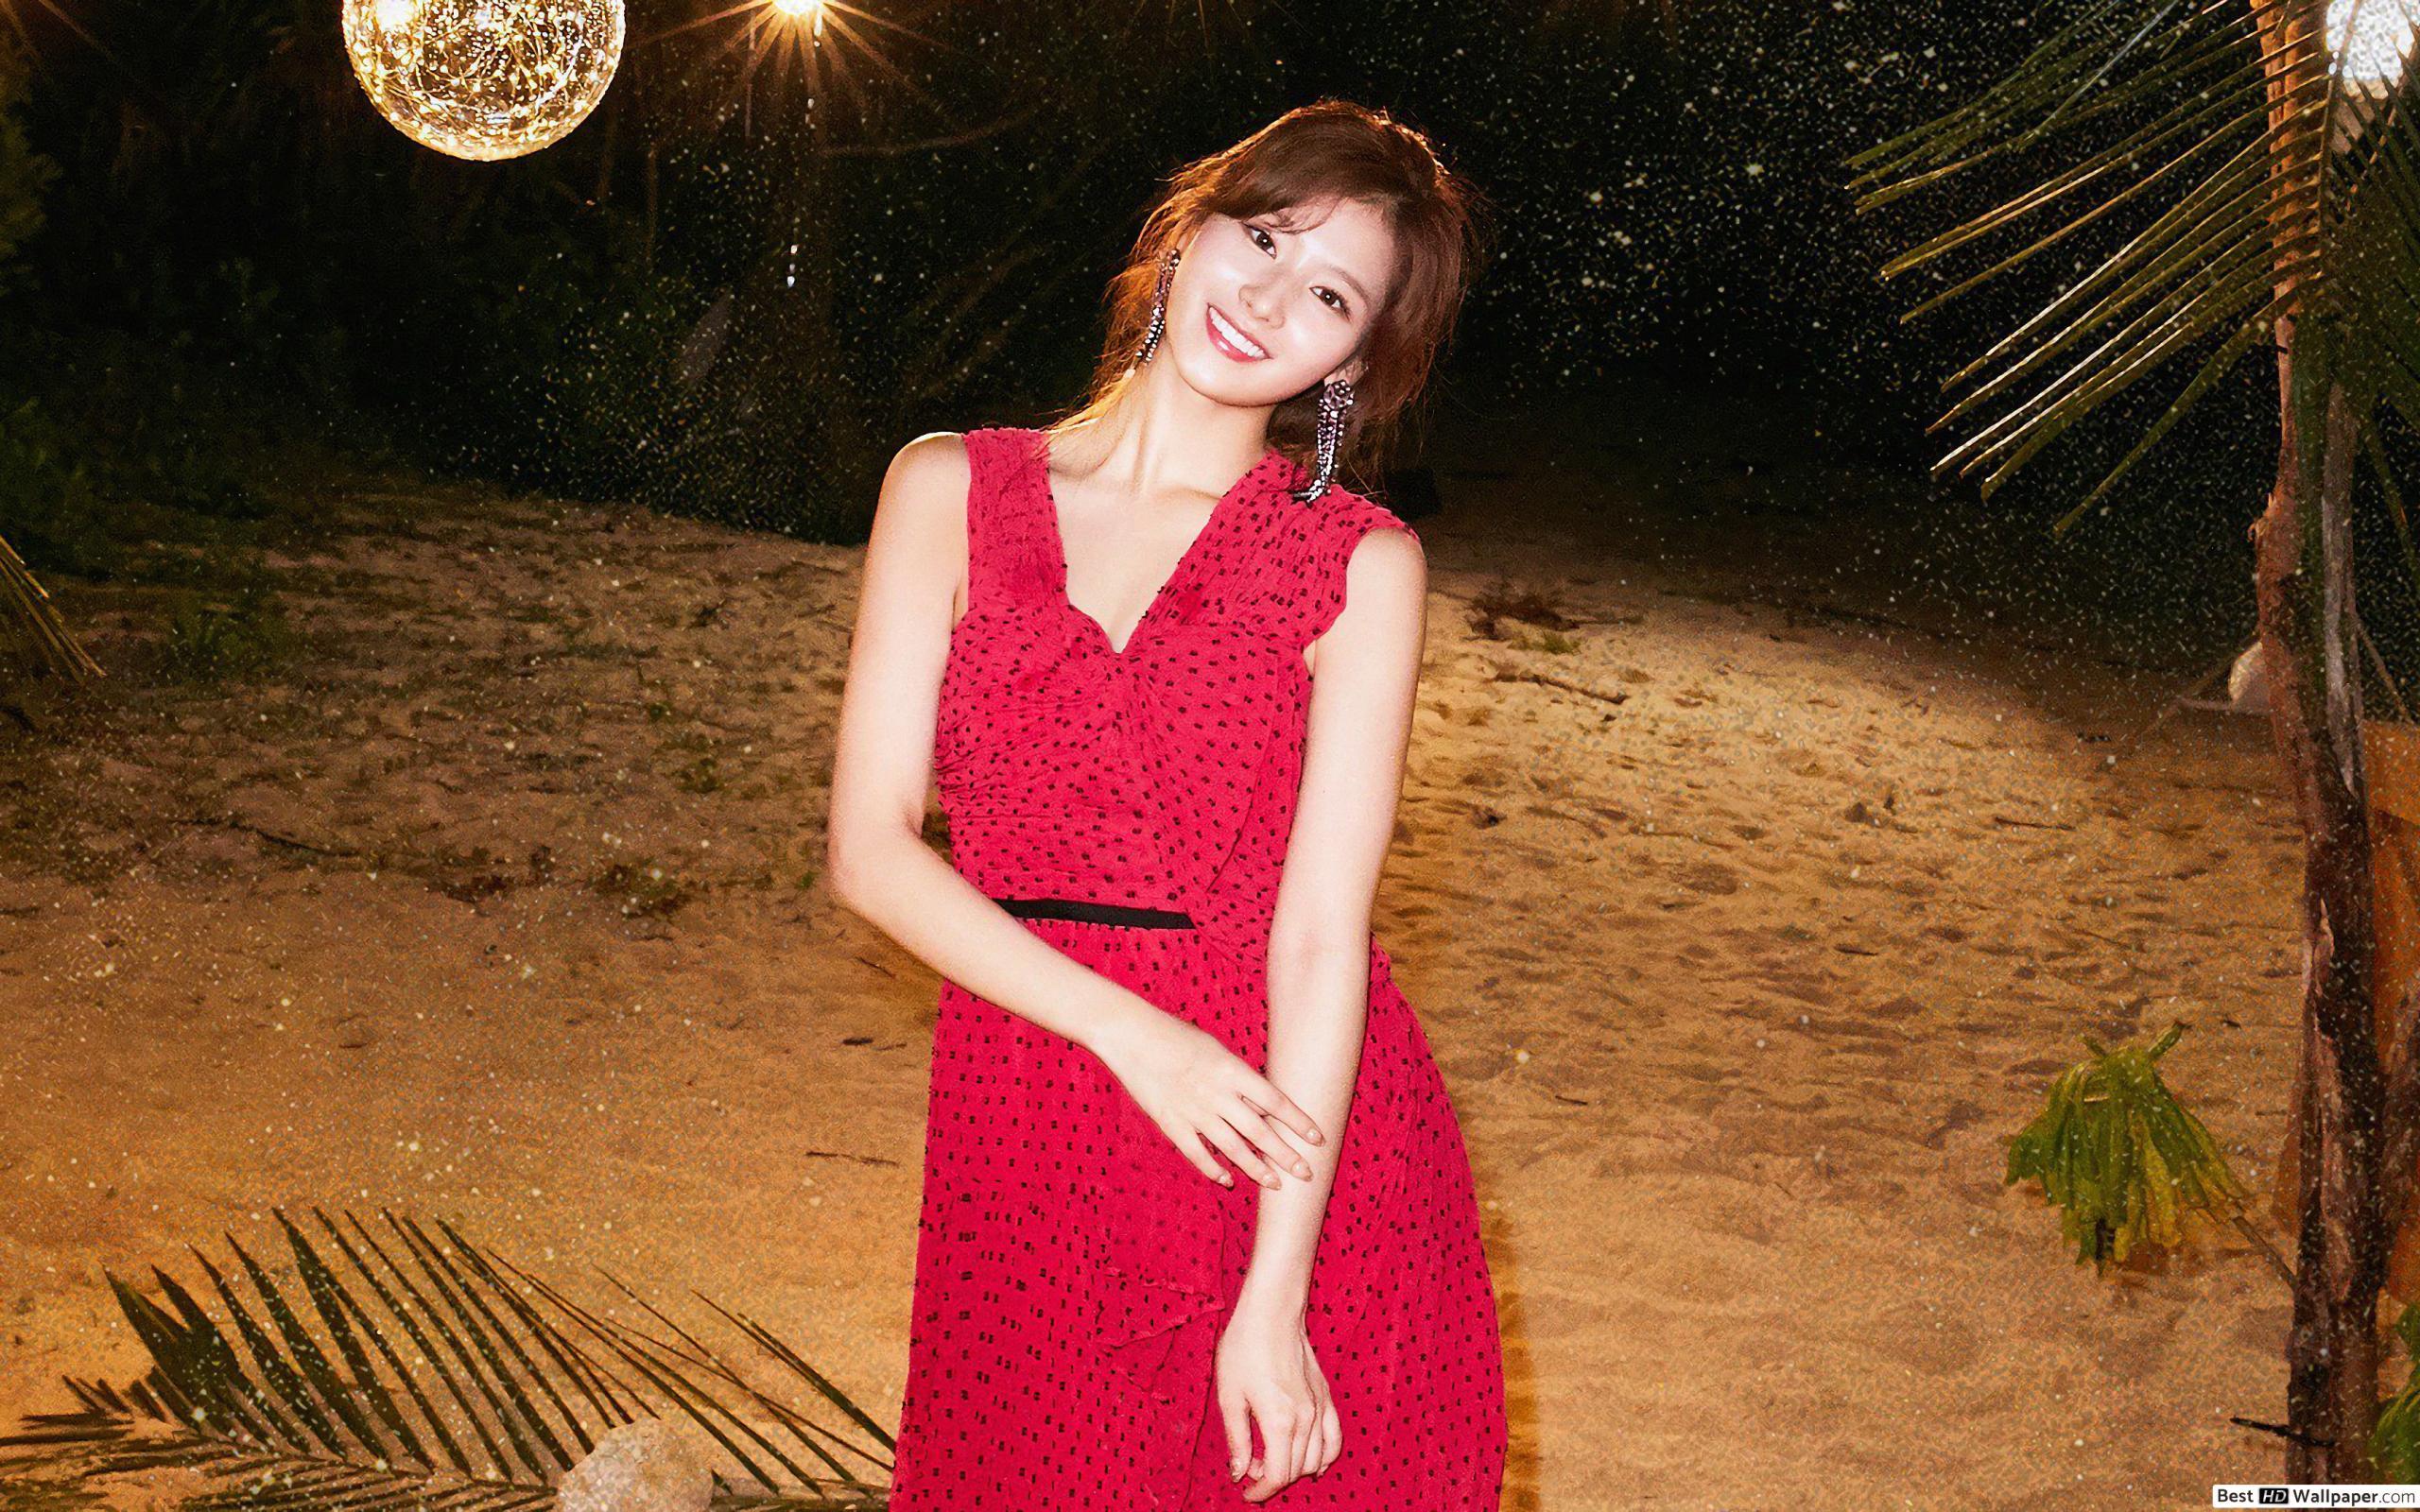 Twice Let's Dance The Night Away Album , HD Wallpaper & Backgrounds